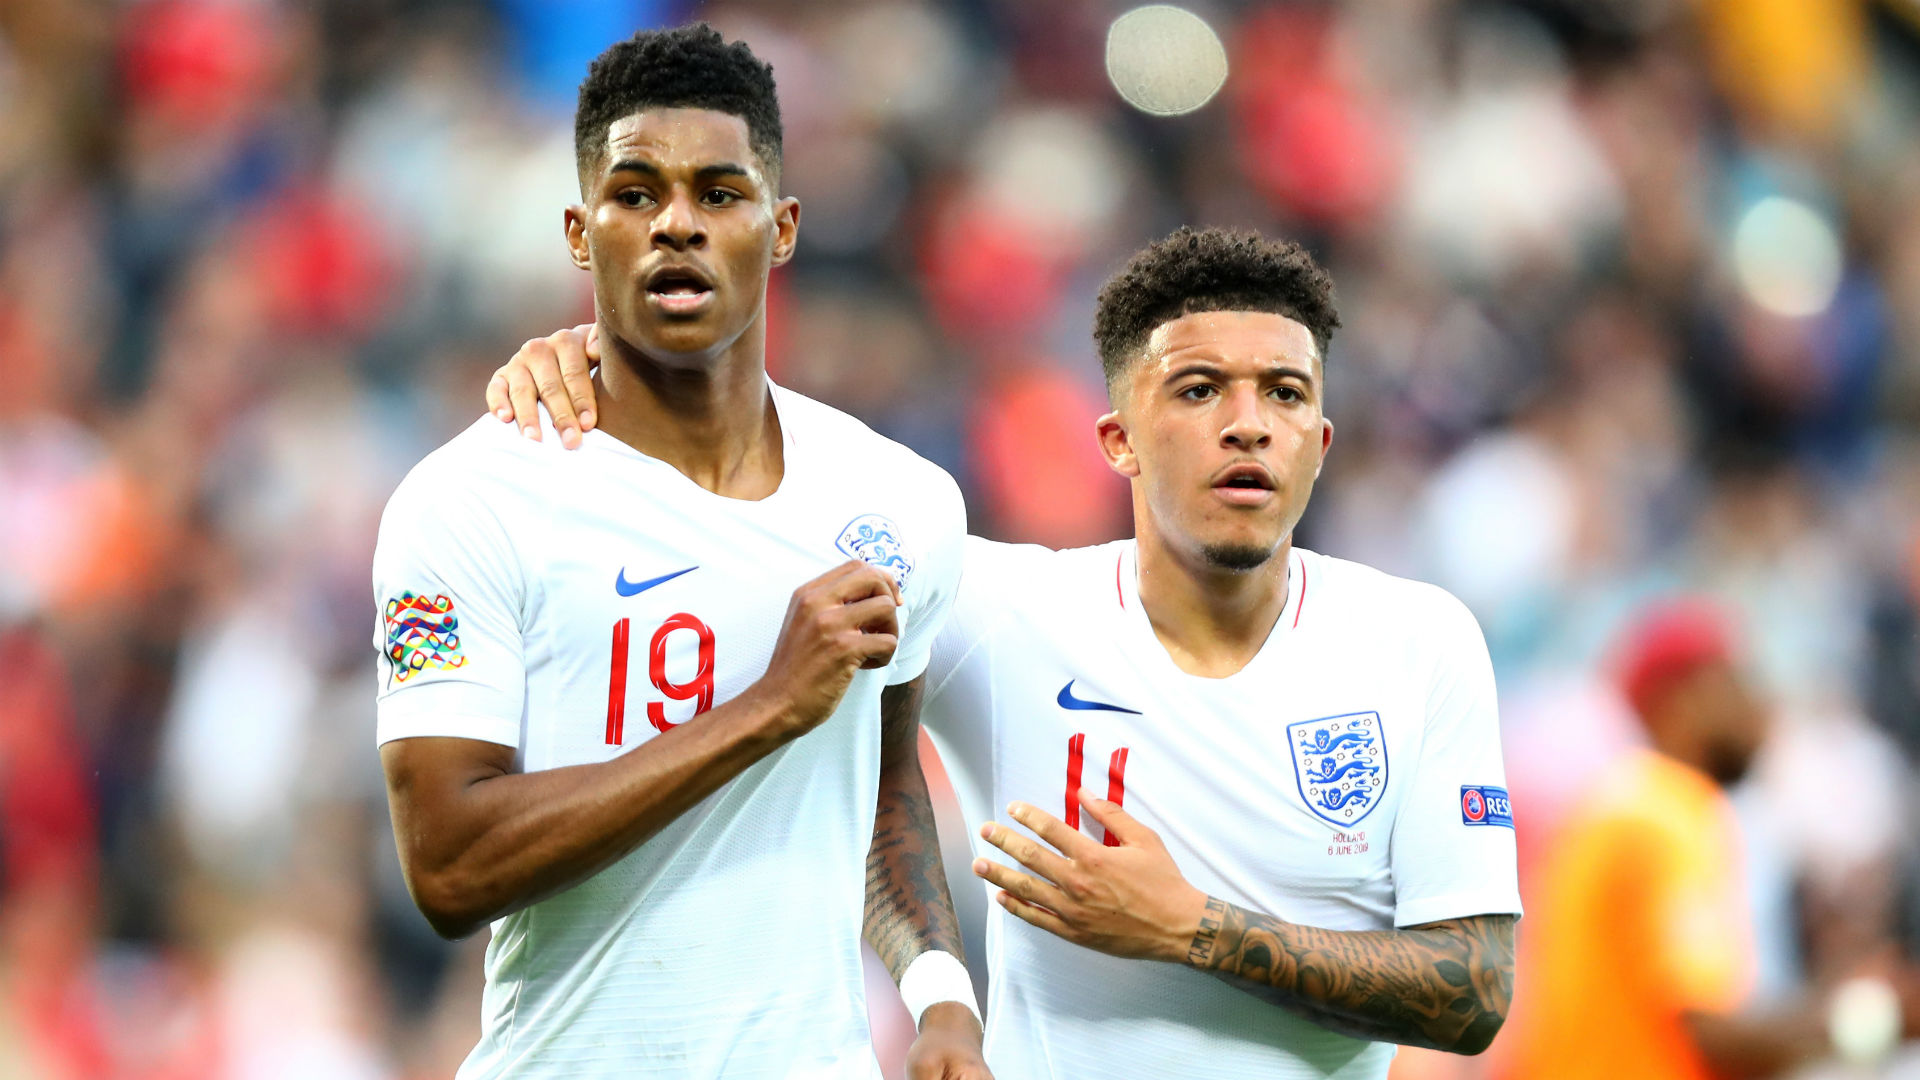 Coronavirus: Rashford & Sancho among England players competing in FIFA 20 tournament